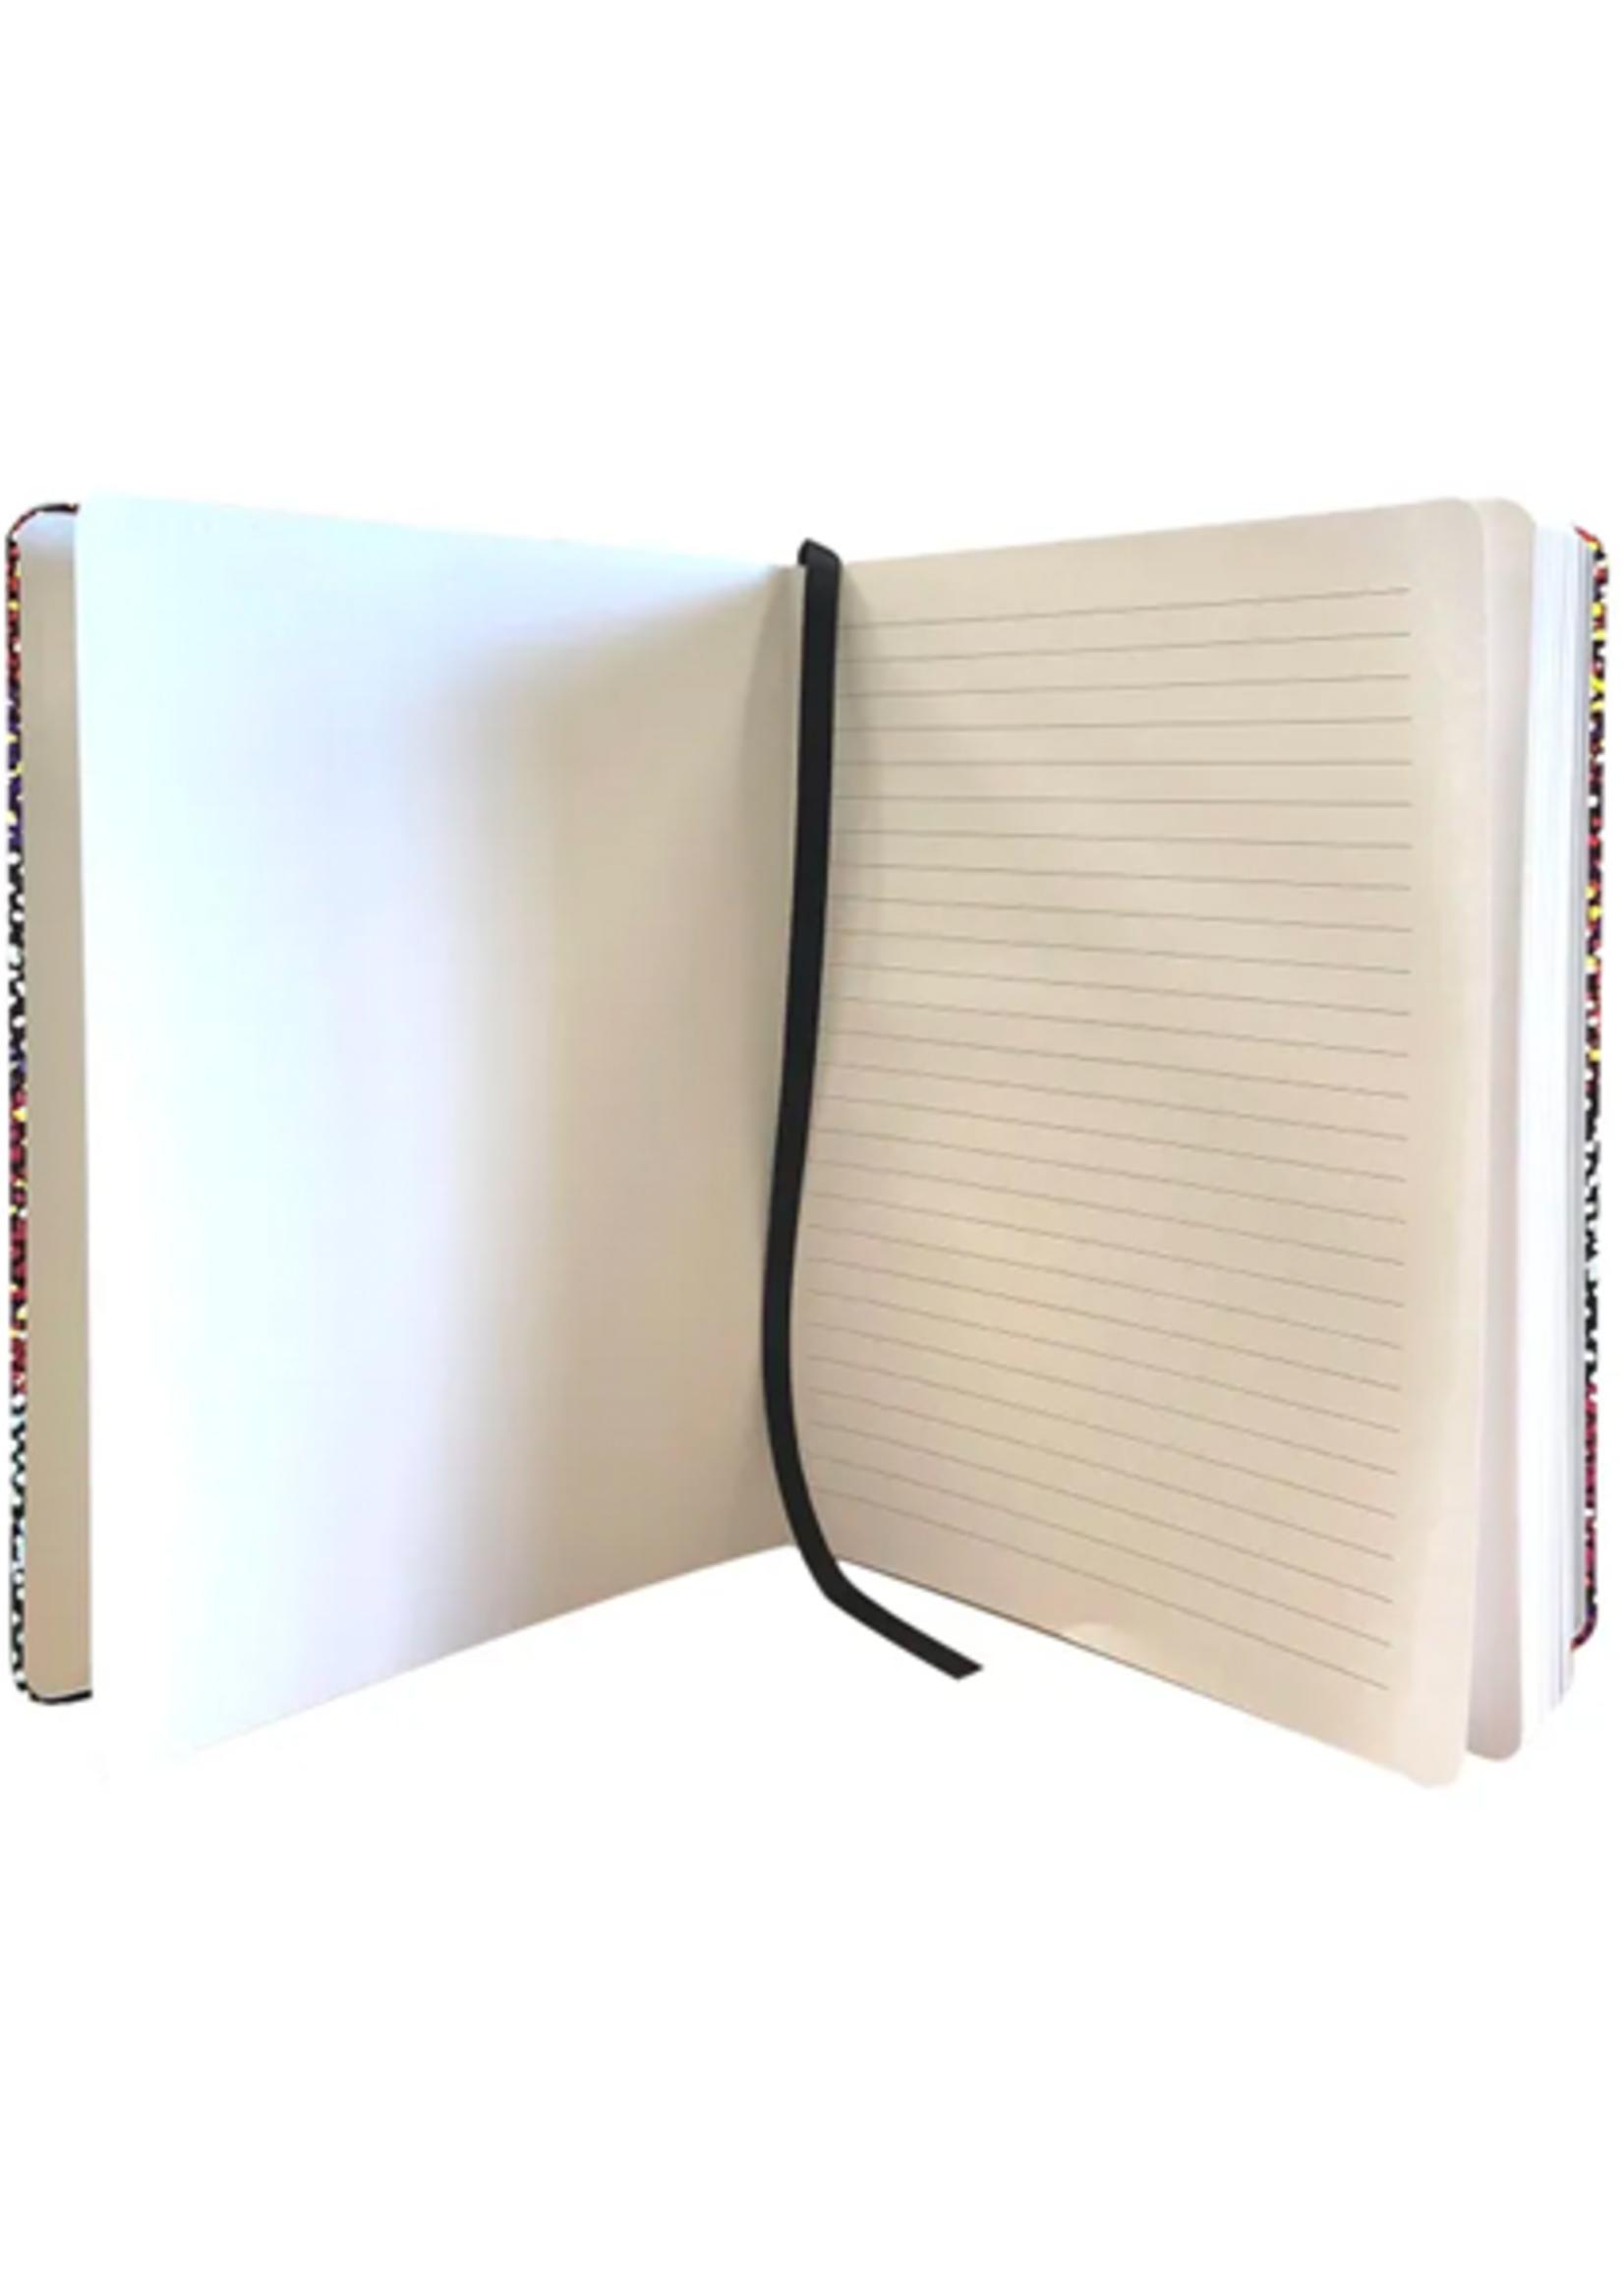 Utopia PU Leather Journal - Gloria Petyarre 137